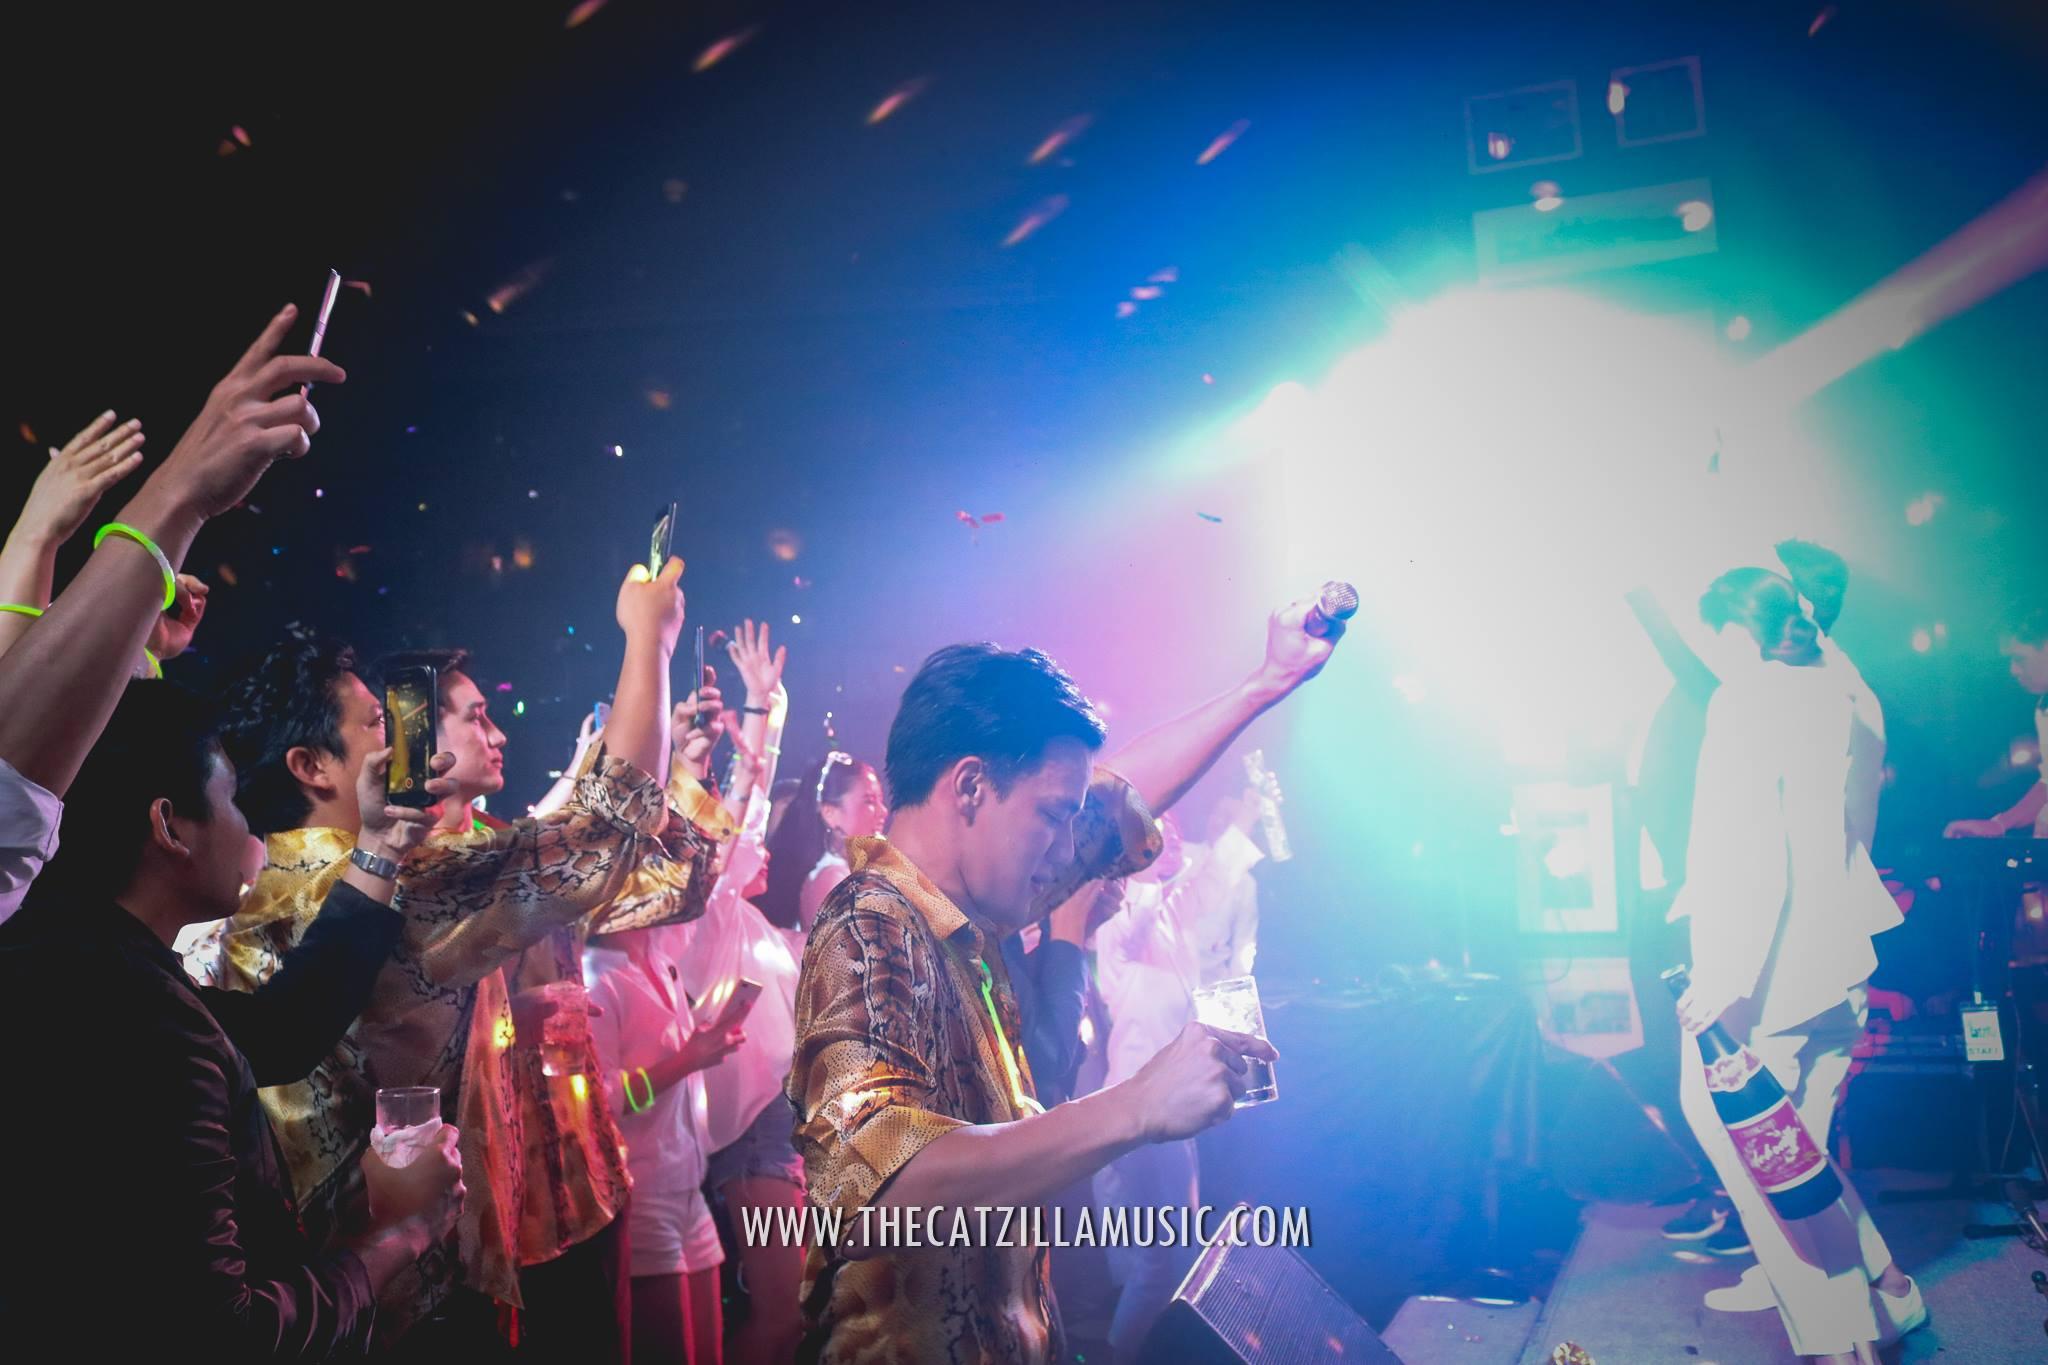 after party งานแต่ง-วงดนตรีงานแต่งงาน-after-party-วงดนตรีงานแต่ง-วงดนตรีงานแต่งมันๆ-JW-Marriott-Bangkok-Wedding-บุ๋นแบนด์-Catzilla-วงดนตรี-after-party-ราคา-จ้างวงดนตรีสด-วงดนตรีงานแต่ง-วงดนตรีงานเลี้ยง